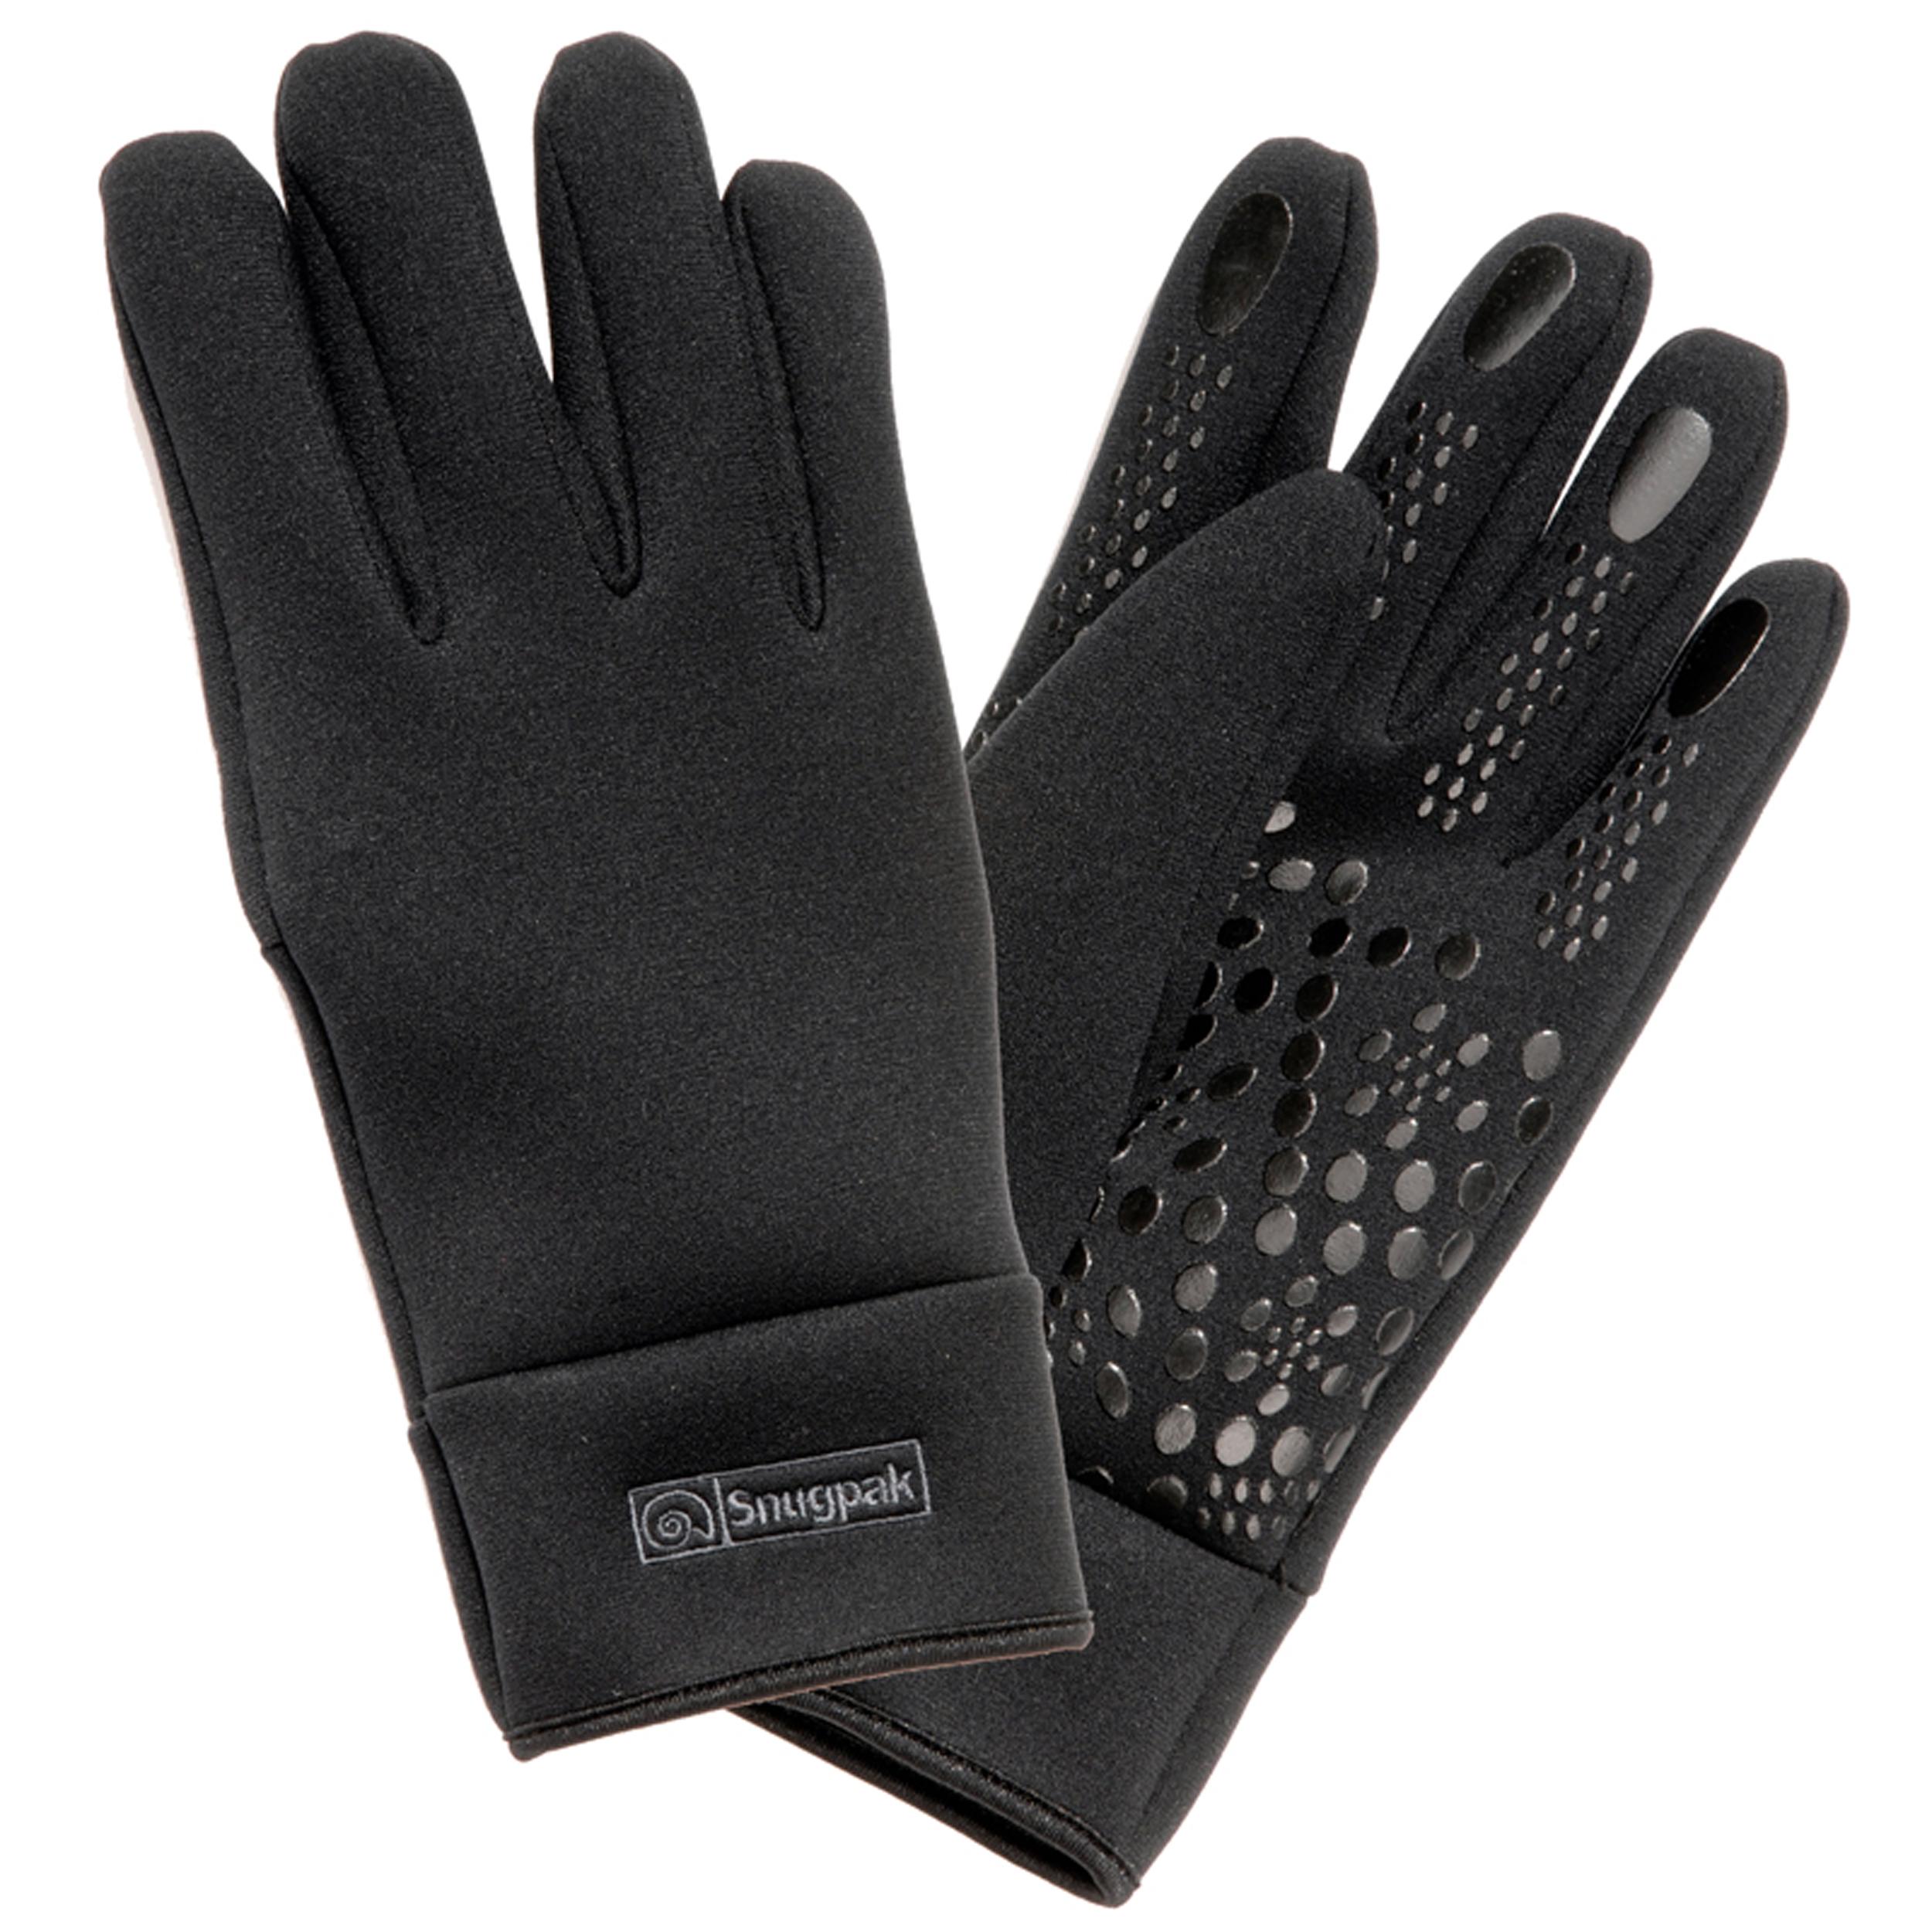 Snugpak Geogrip Glove Black Lg Xl